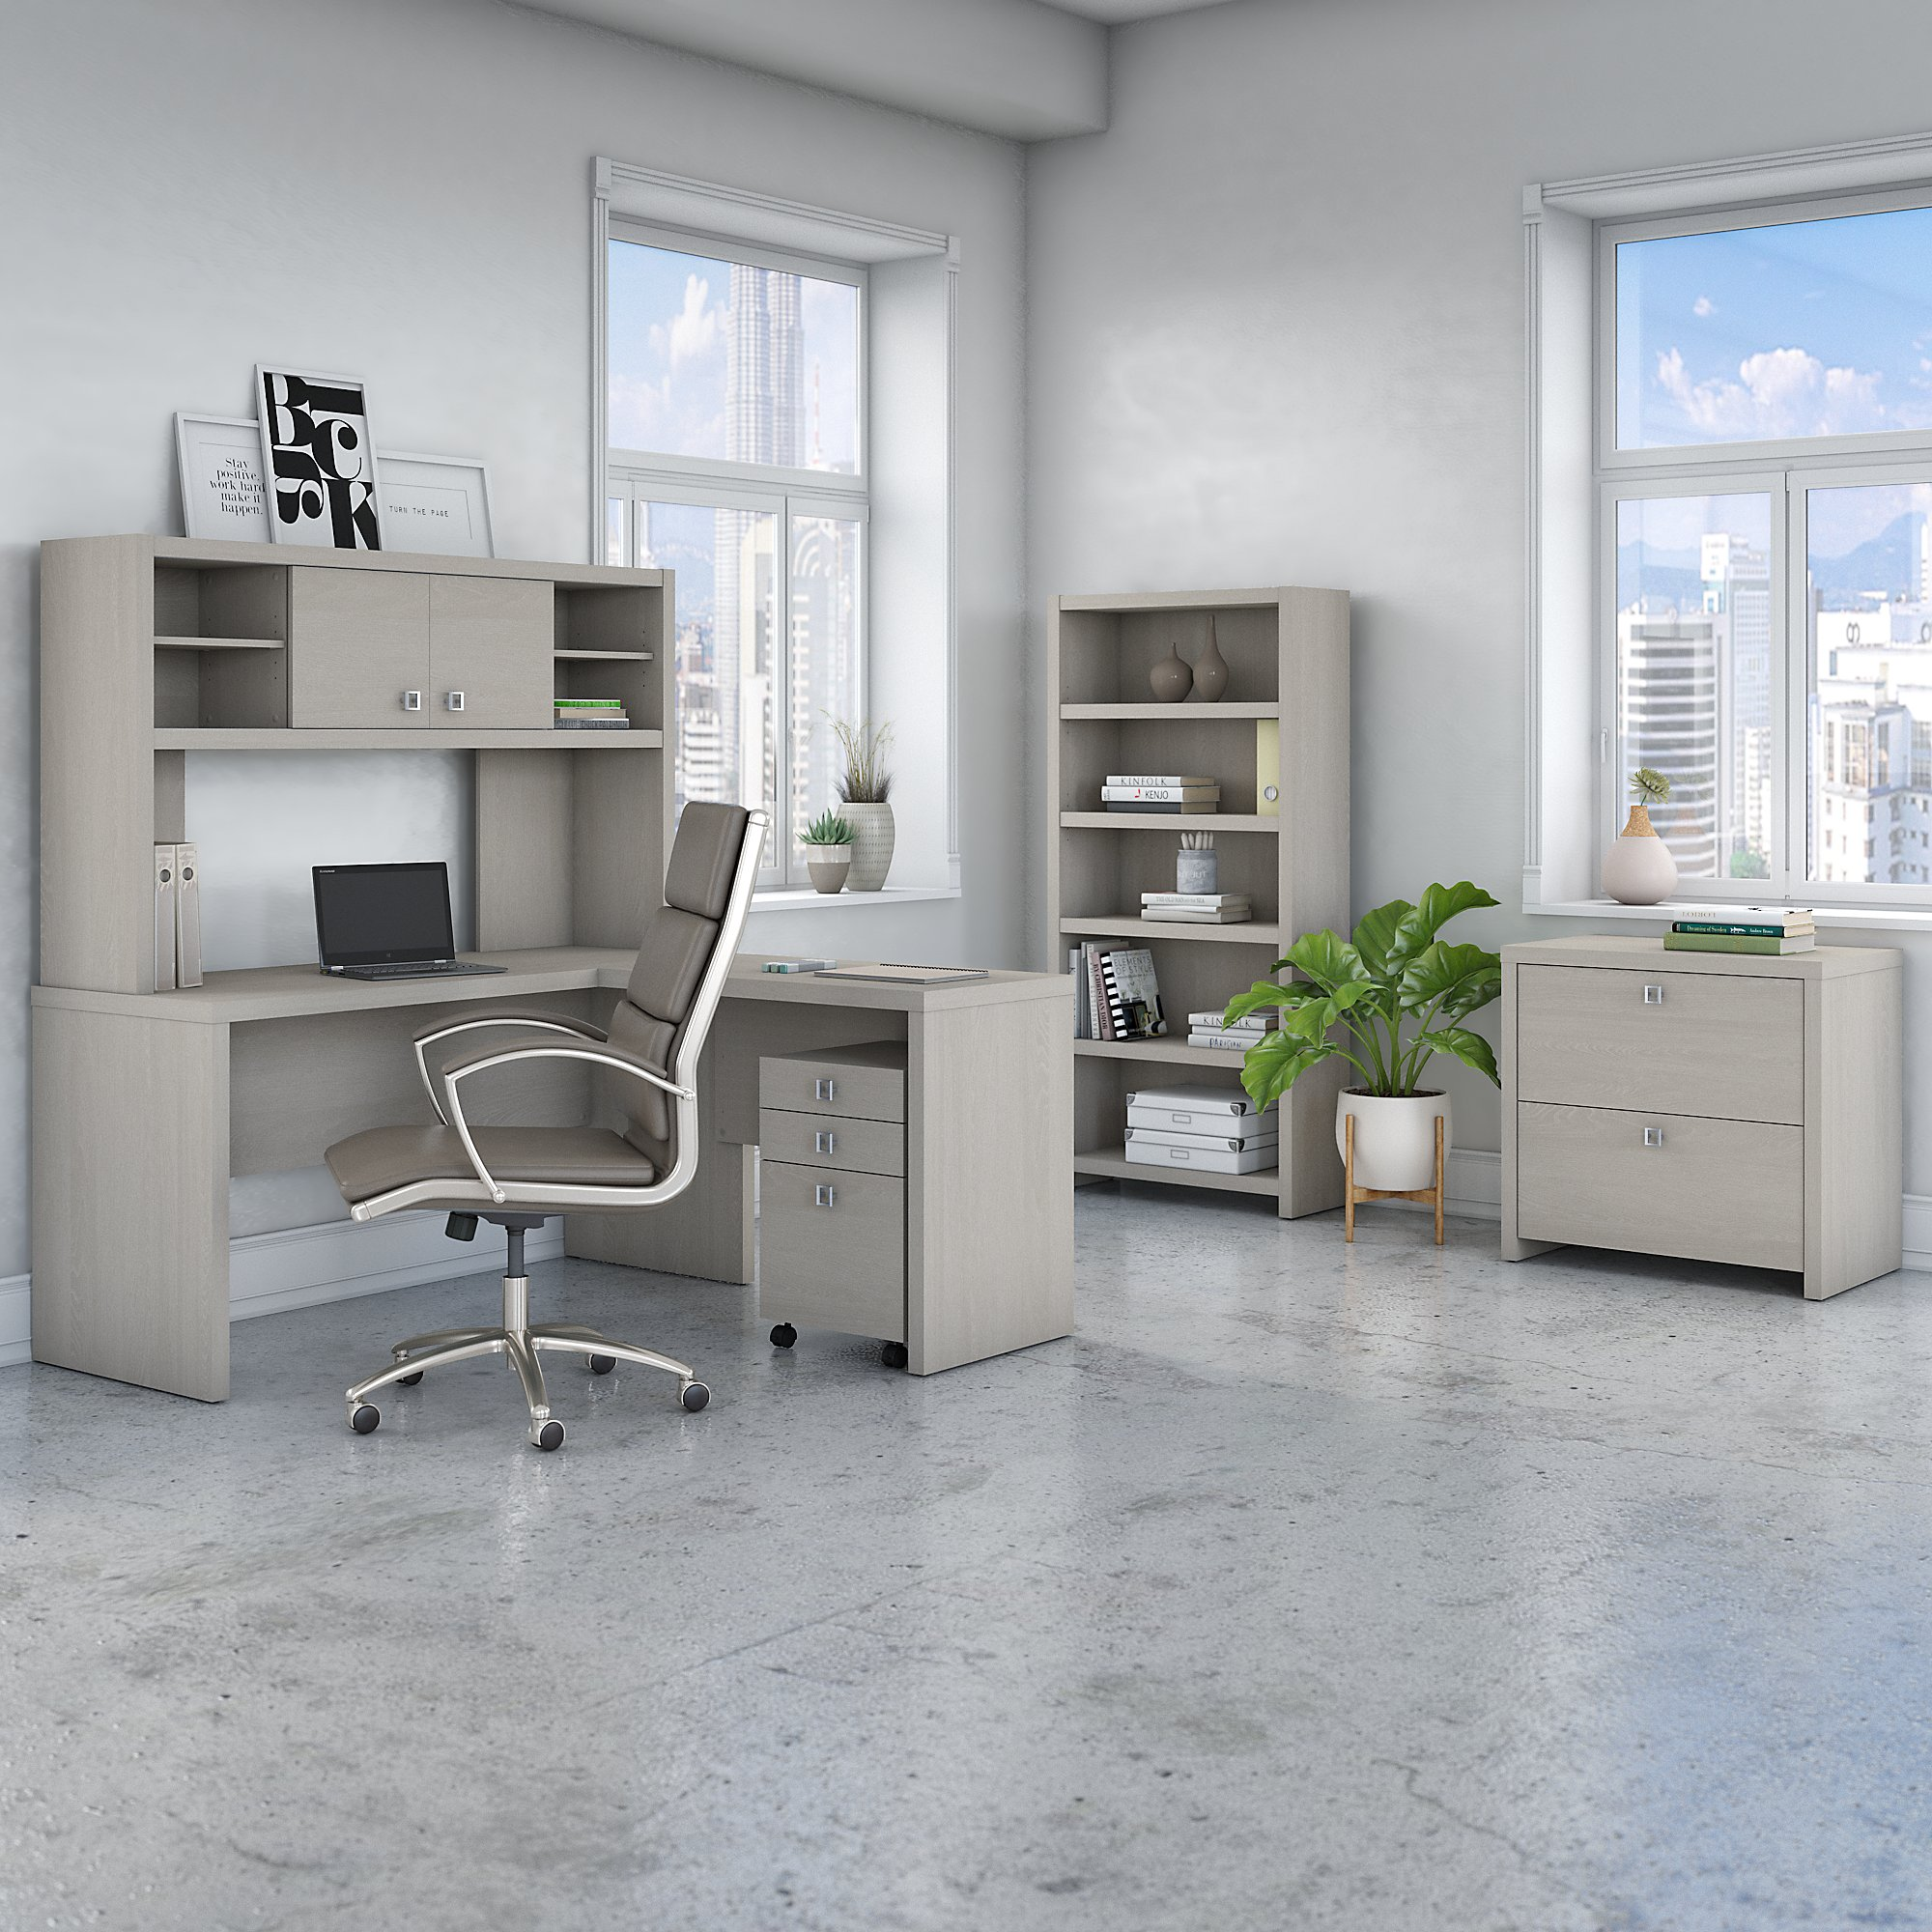 sand gray echo executive furniture set